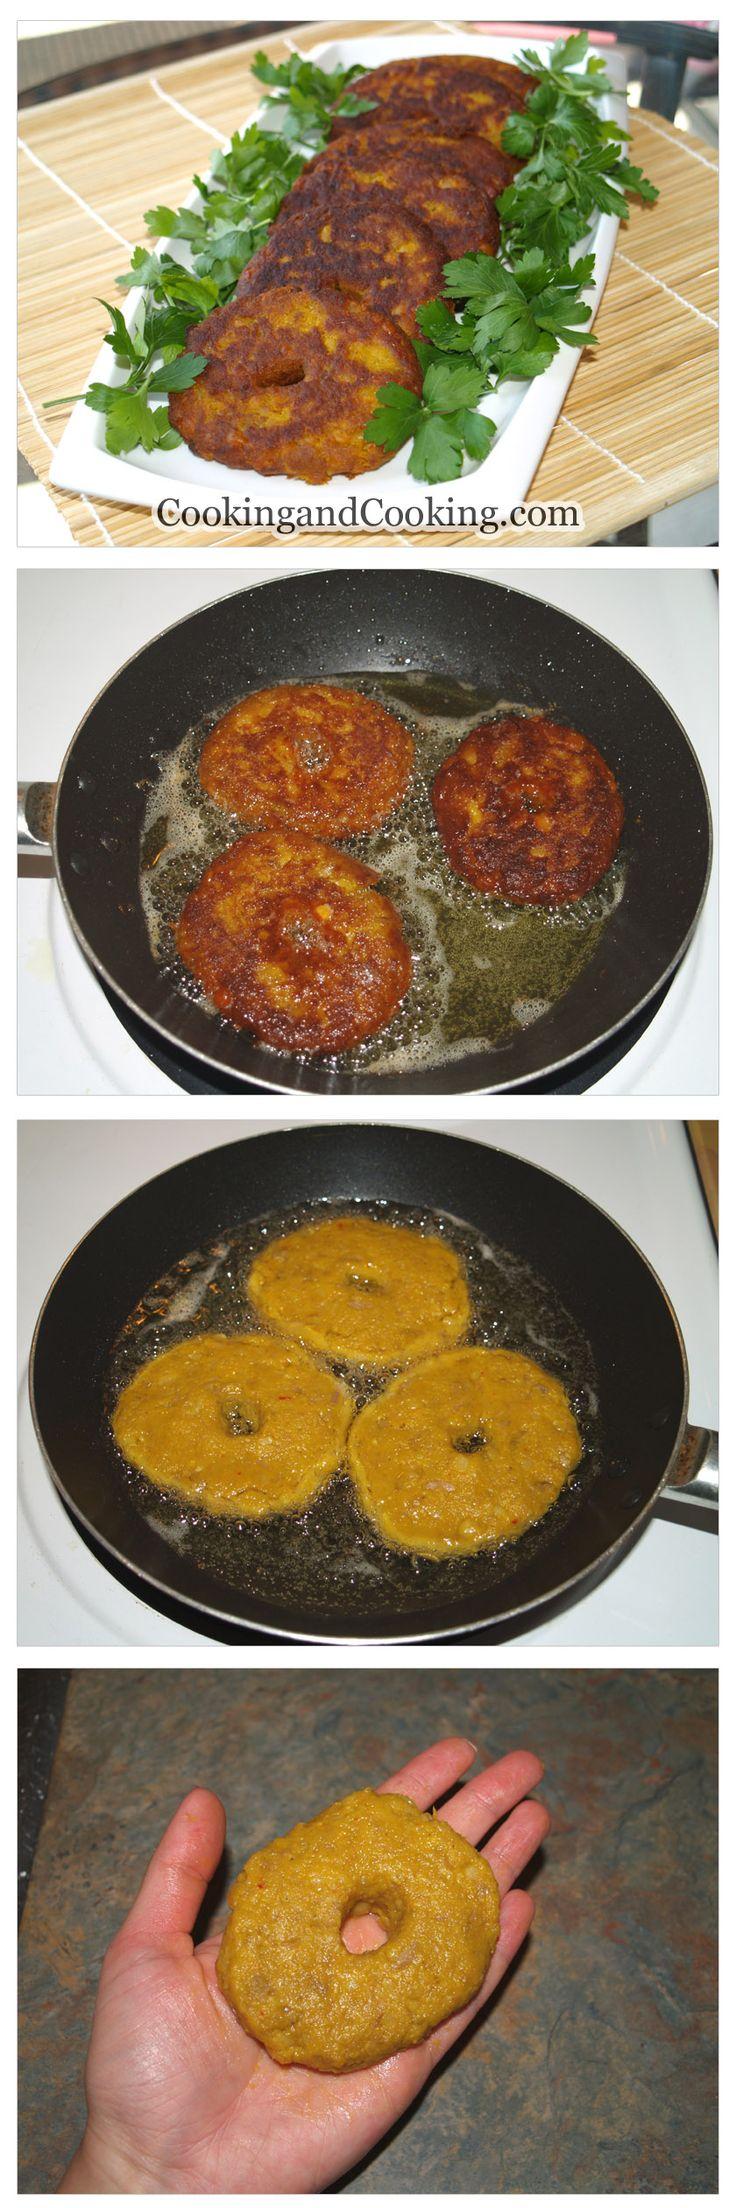 Split Pea & Meat Patties Recipe